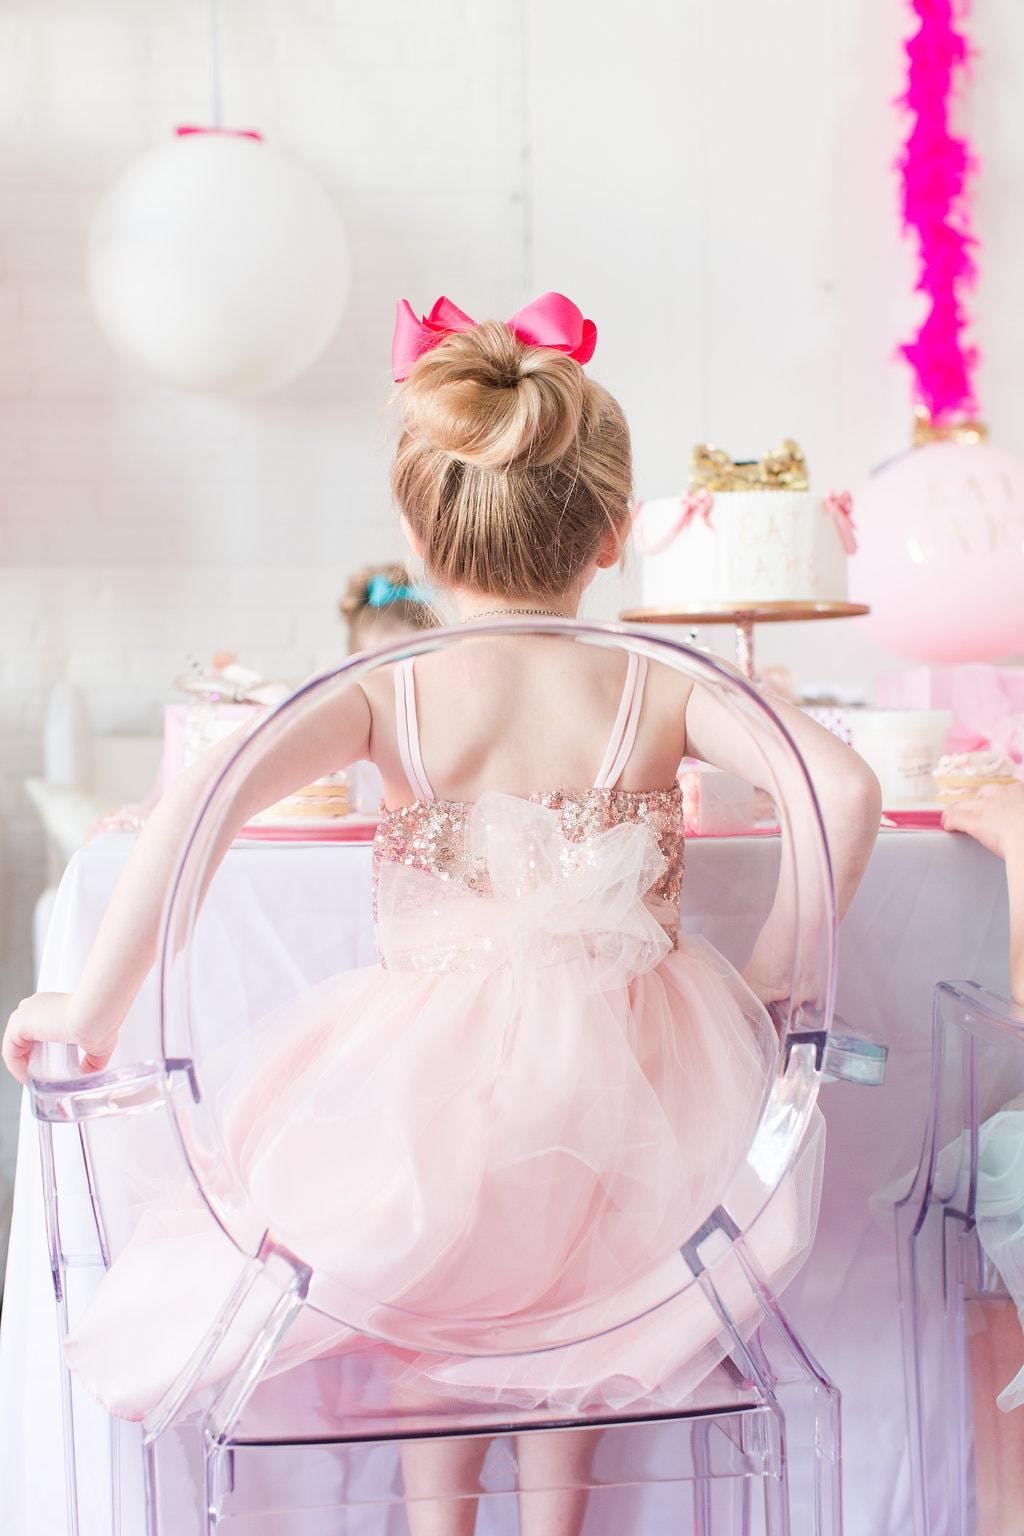 KIDS CAKE FOR BREAKFAST BIRTHDAY PARTY